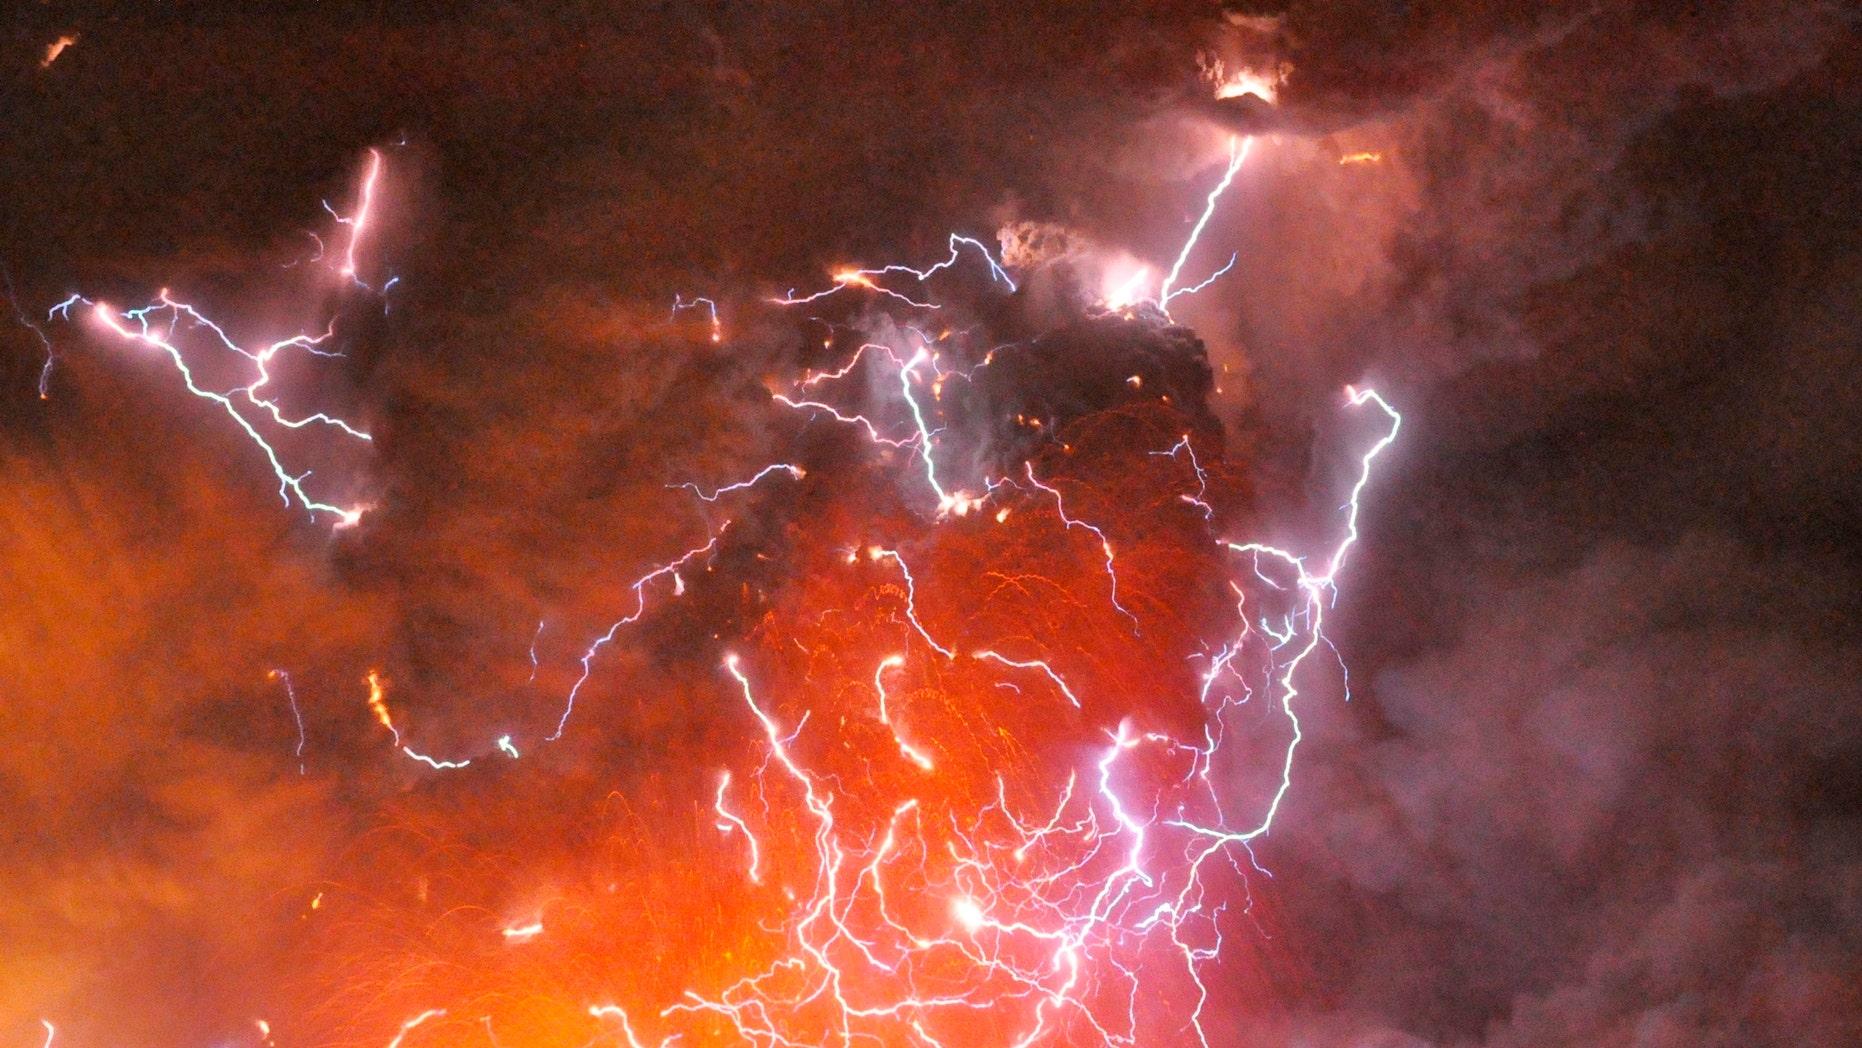 File photo - Volcanic lightning or a dirty thunderstorm is seen above Shinmoedake peak as it erupts, between Miyazaki and Kagoshima prefectures, in this photo taken from Kirishima city and released by Minami-Nippon Shimbun Jan. 28, 2011. (REUTERS/Minami-Nippon Shimbun/Handout)